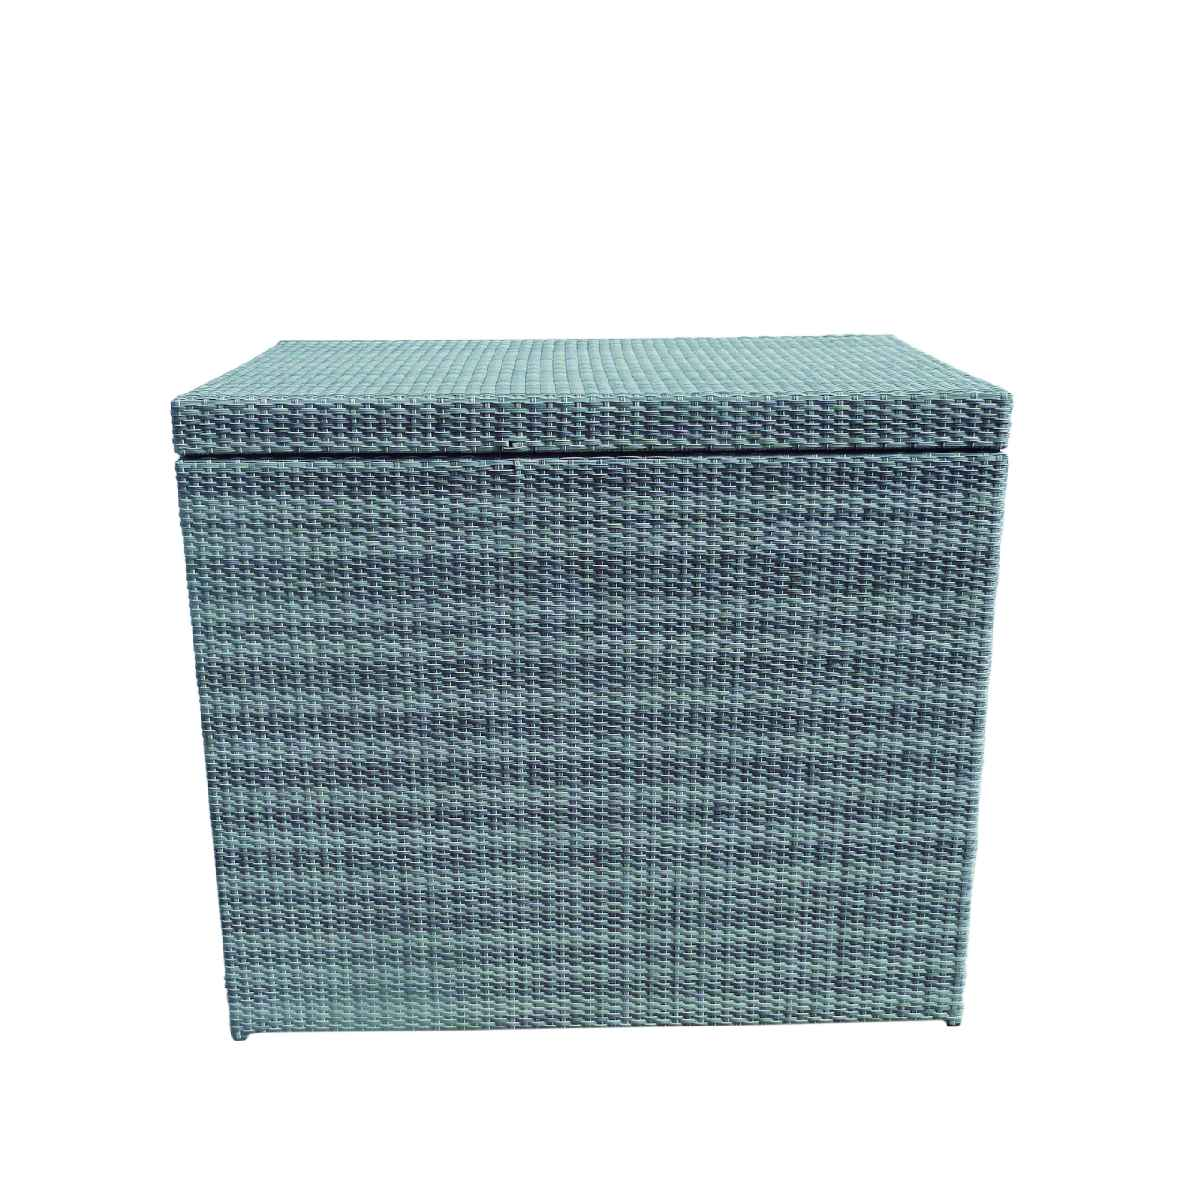 Glencrest Katie Blake Sandringham Waterproof Cushion Storage Box - Grey